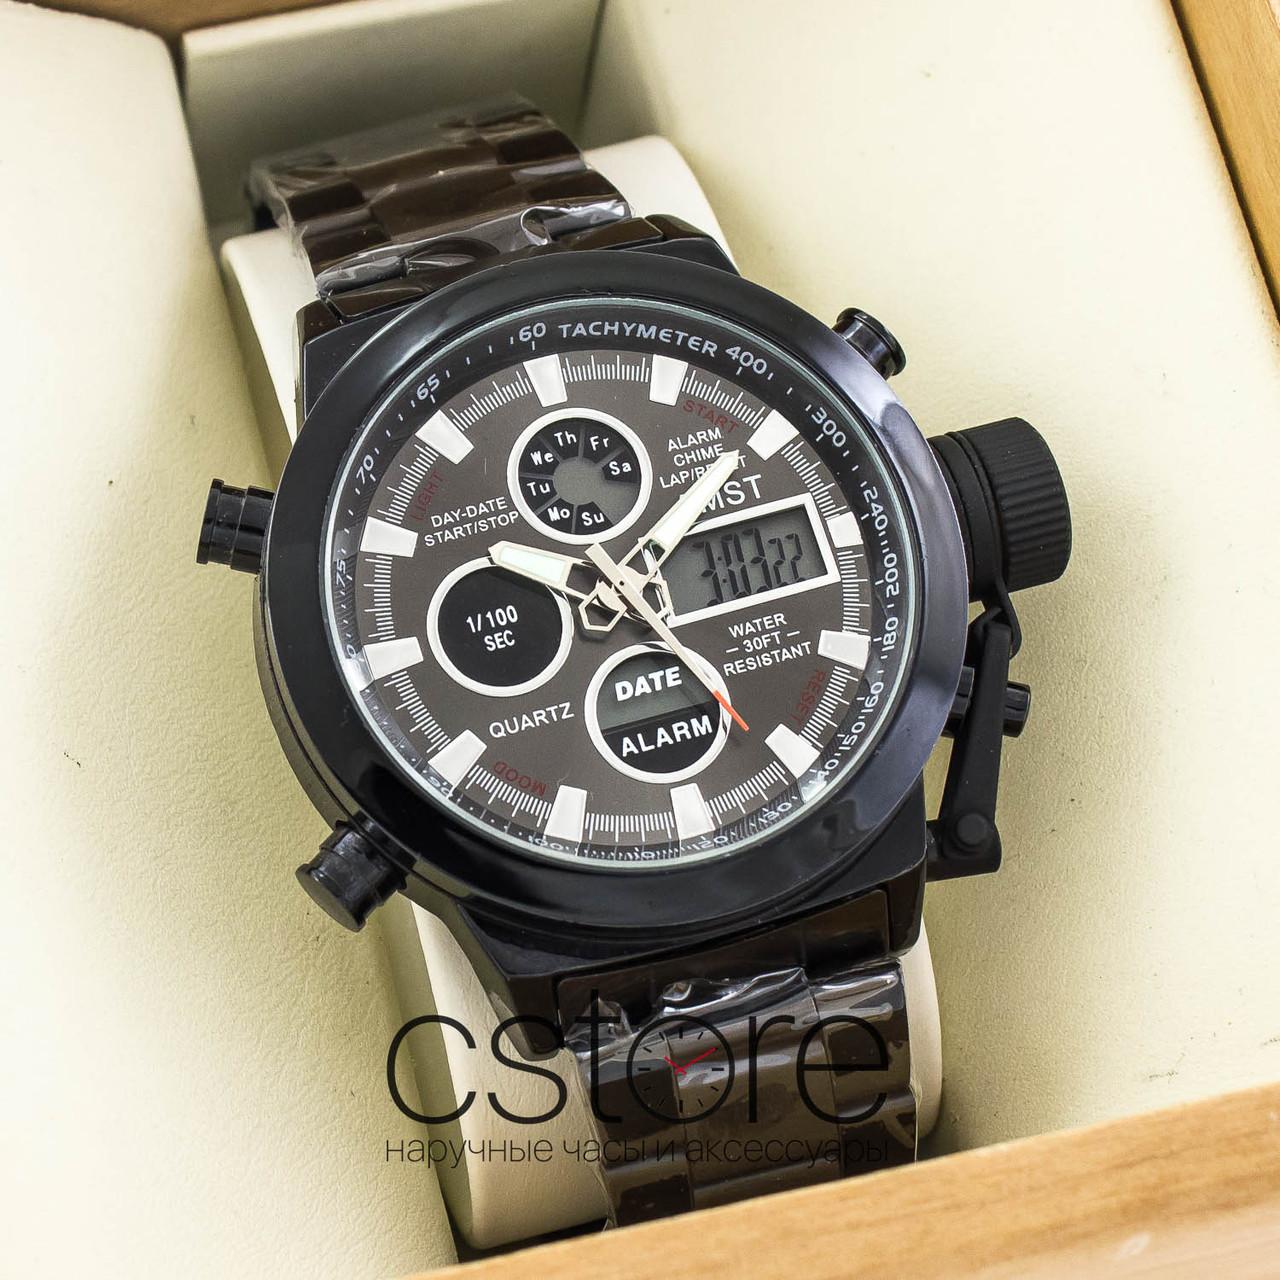 8d2c4d73de14 ... Мужские армейские наручные часы Amst black black am3003 на браслете  (07482), ...